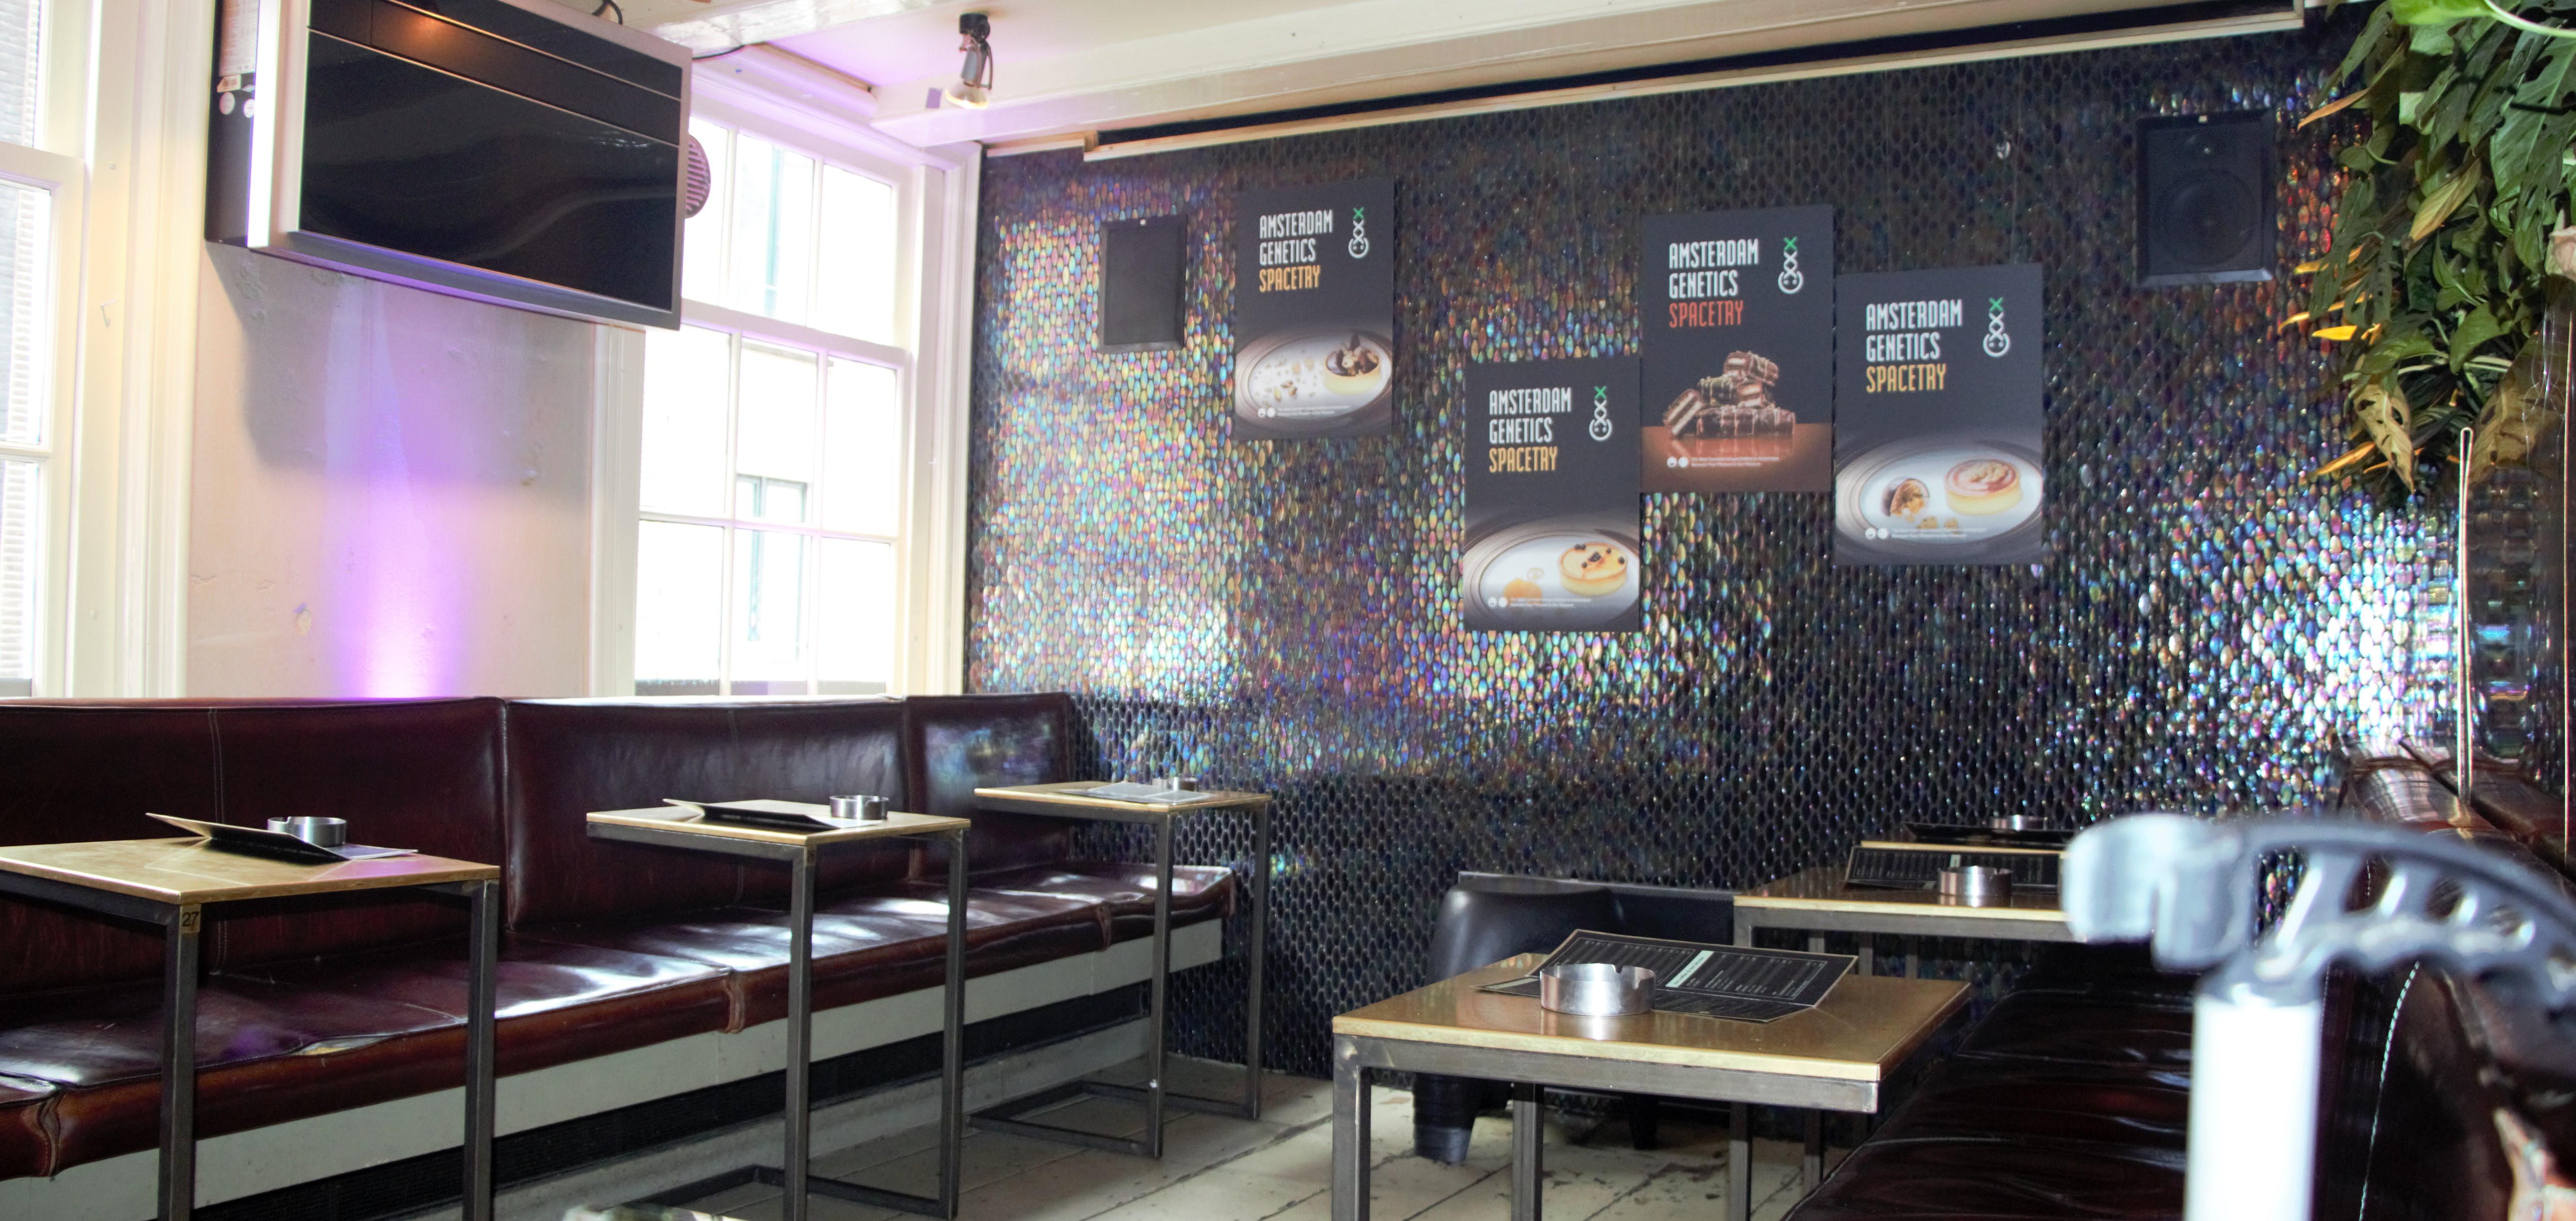 Inside Coffeeshop Amsterdam